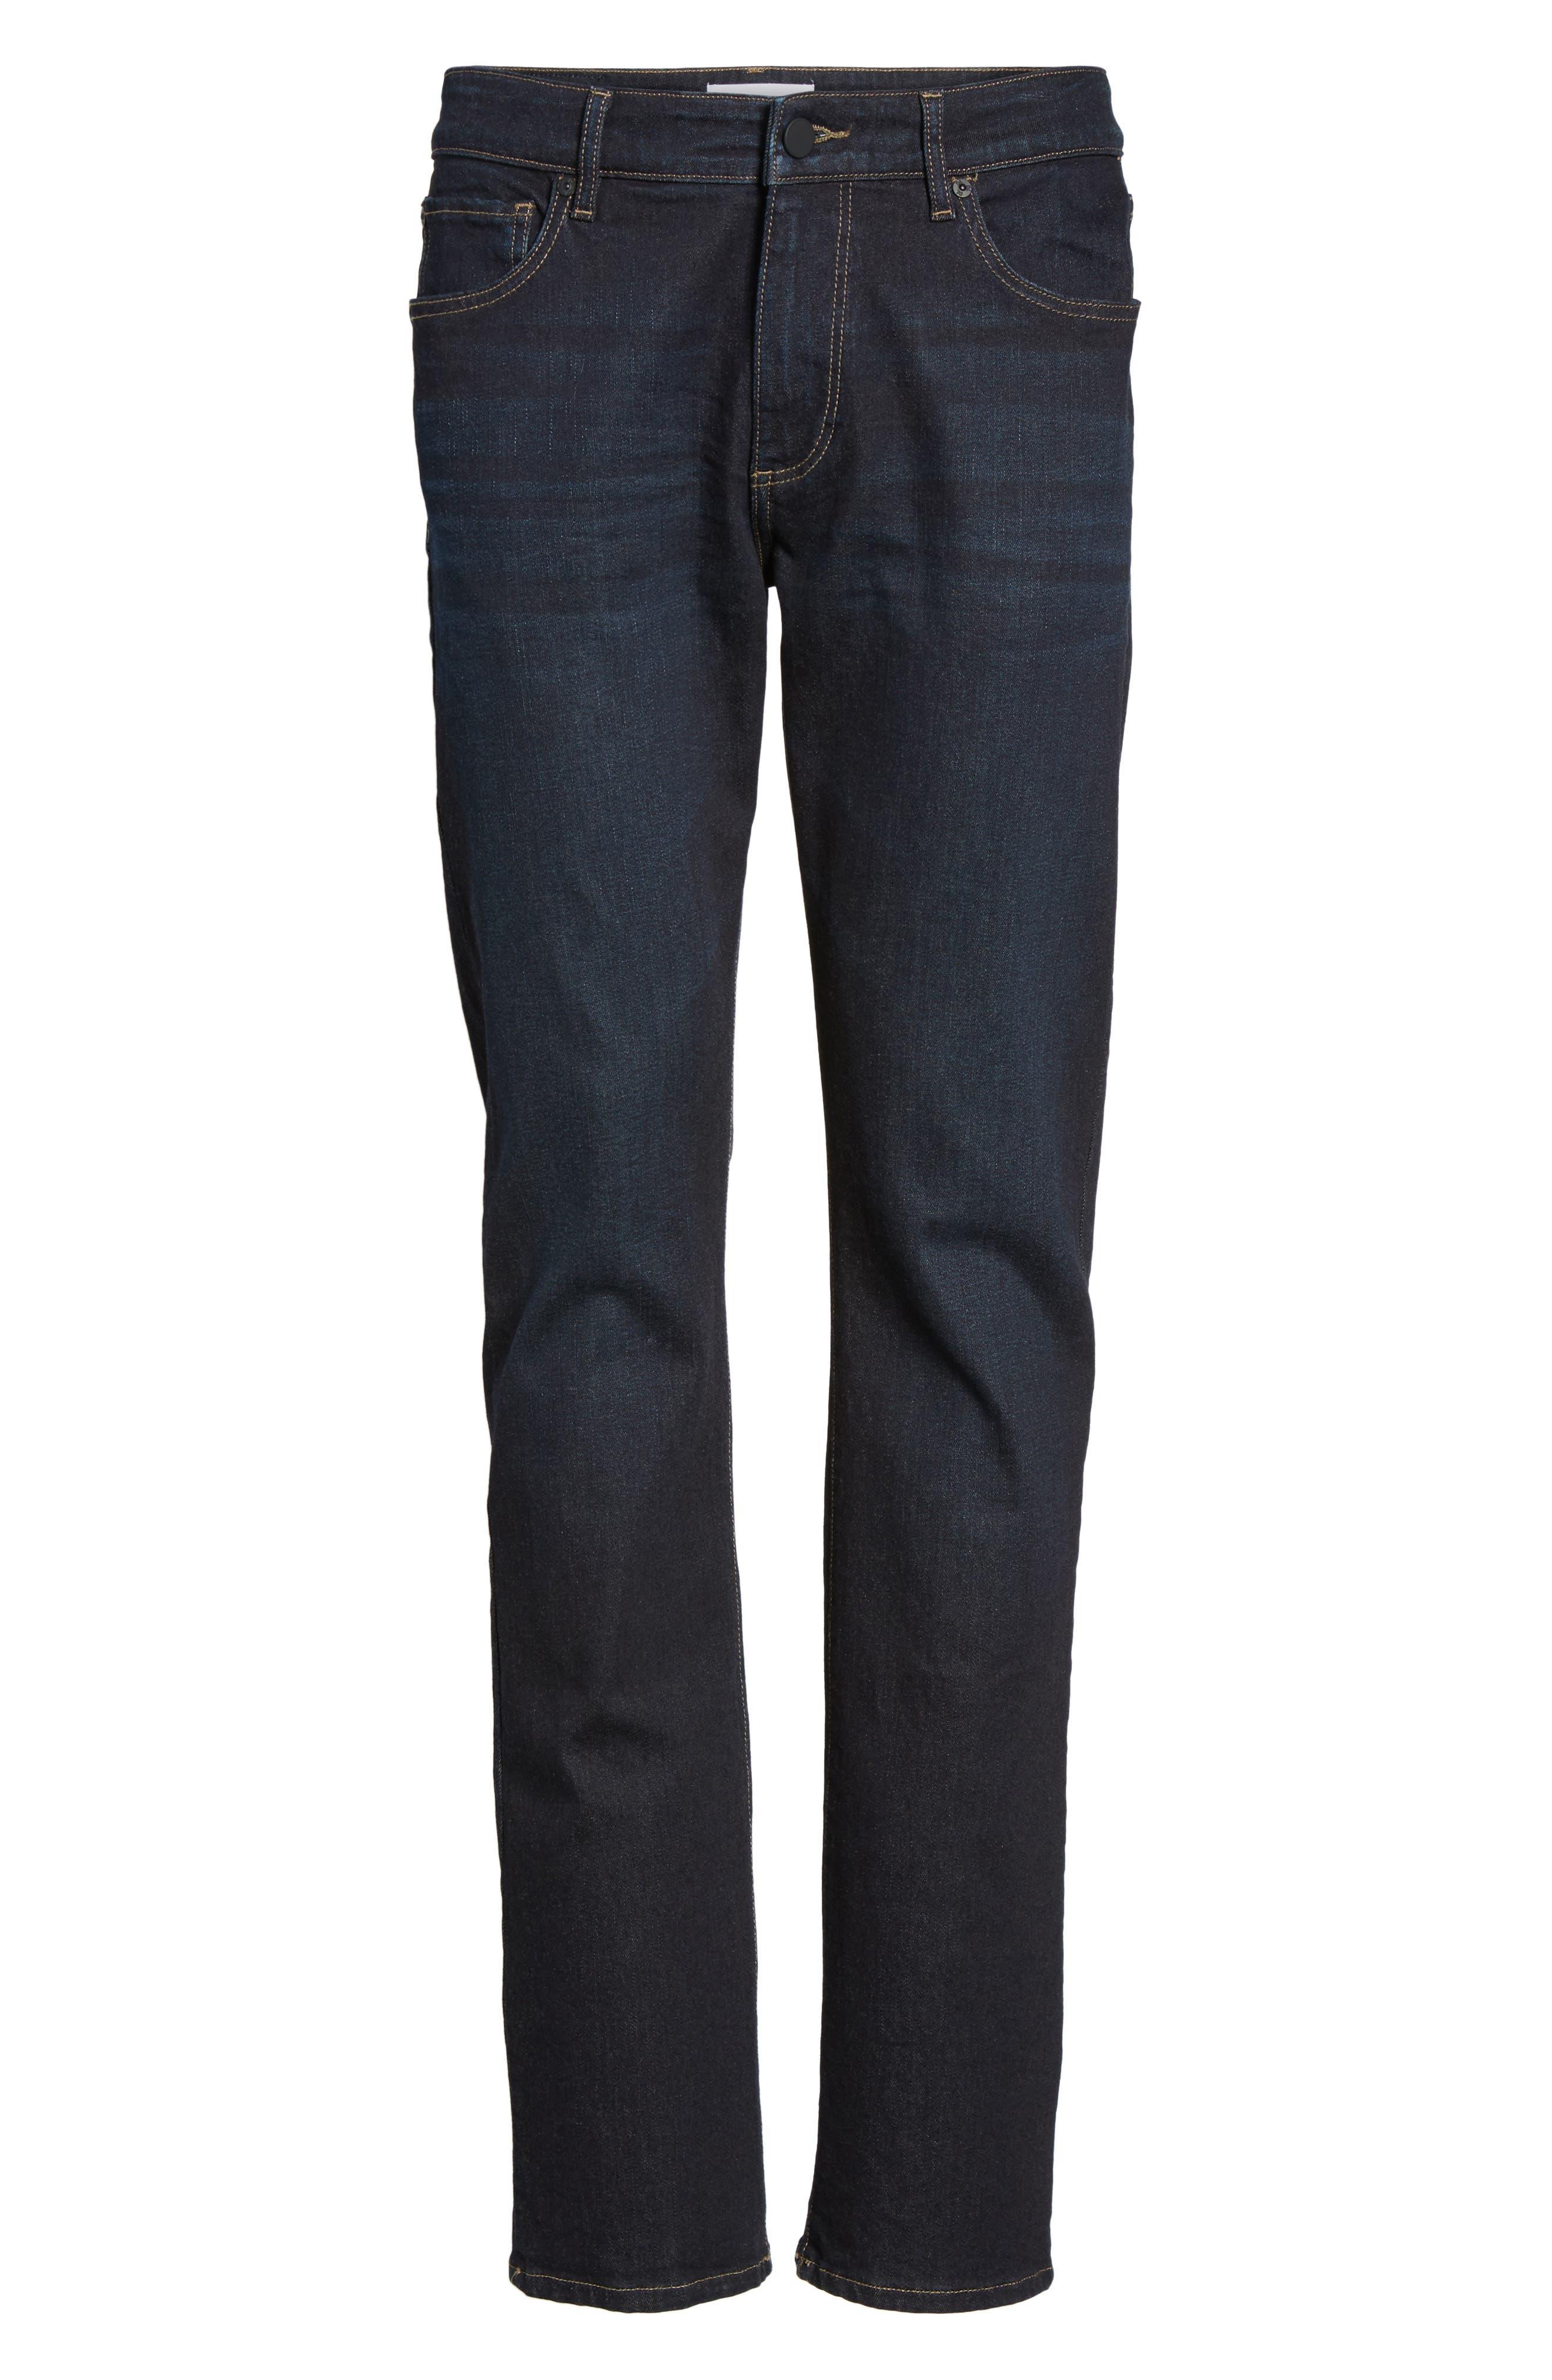 Russell Slim Straight Leg Jeans,                             Alternate thumbnail 6, color,                             425